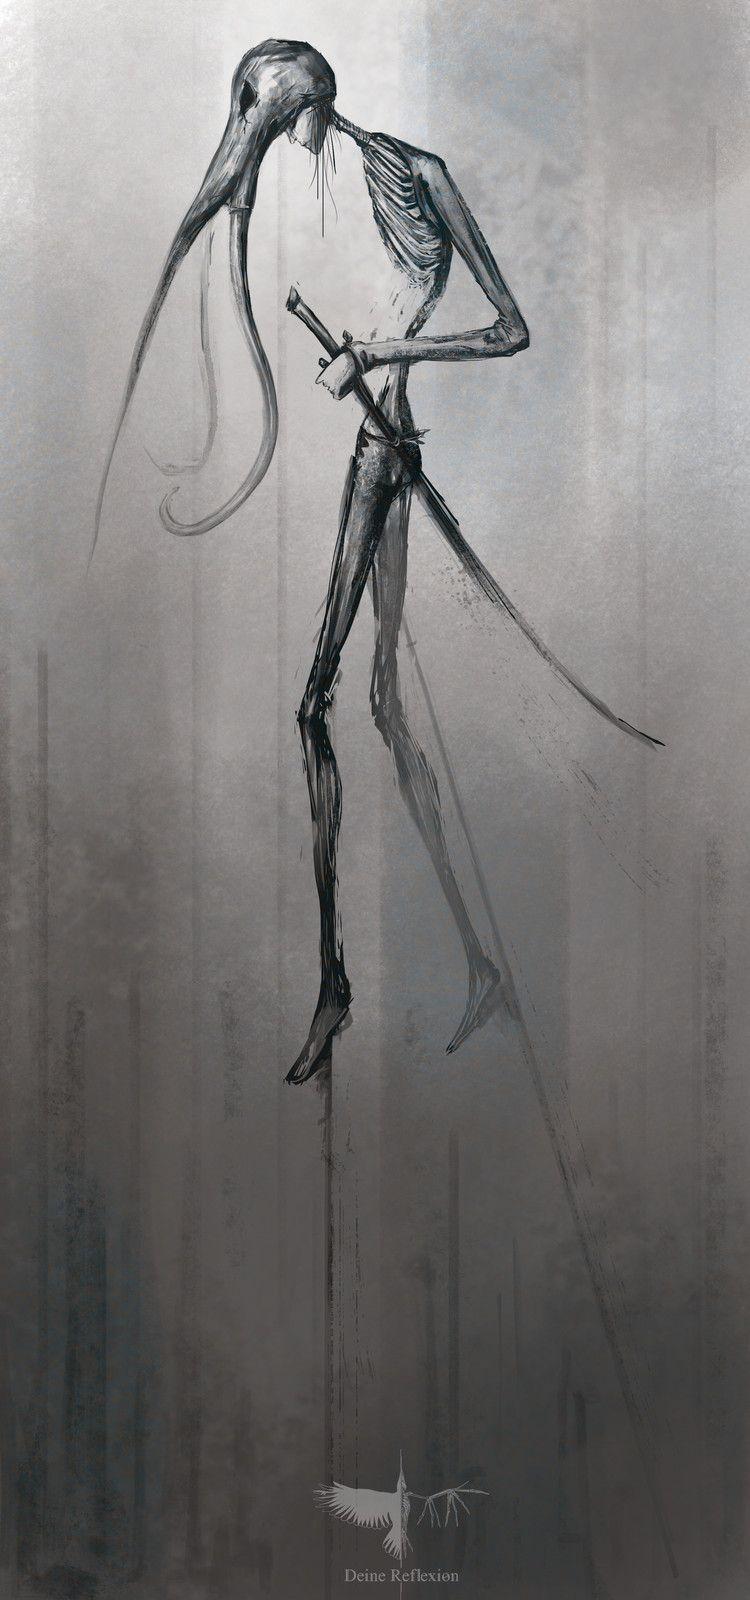 sketches, Deine Reflexion on ArtStation at https://www.artstation.com/artwork/5Z3VP